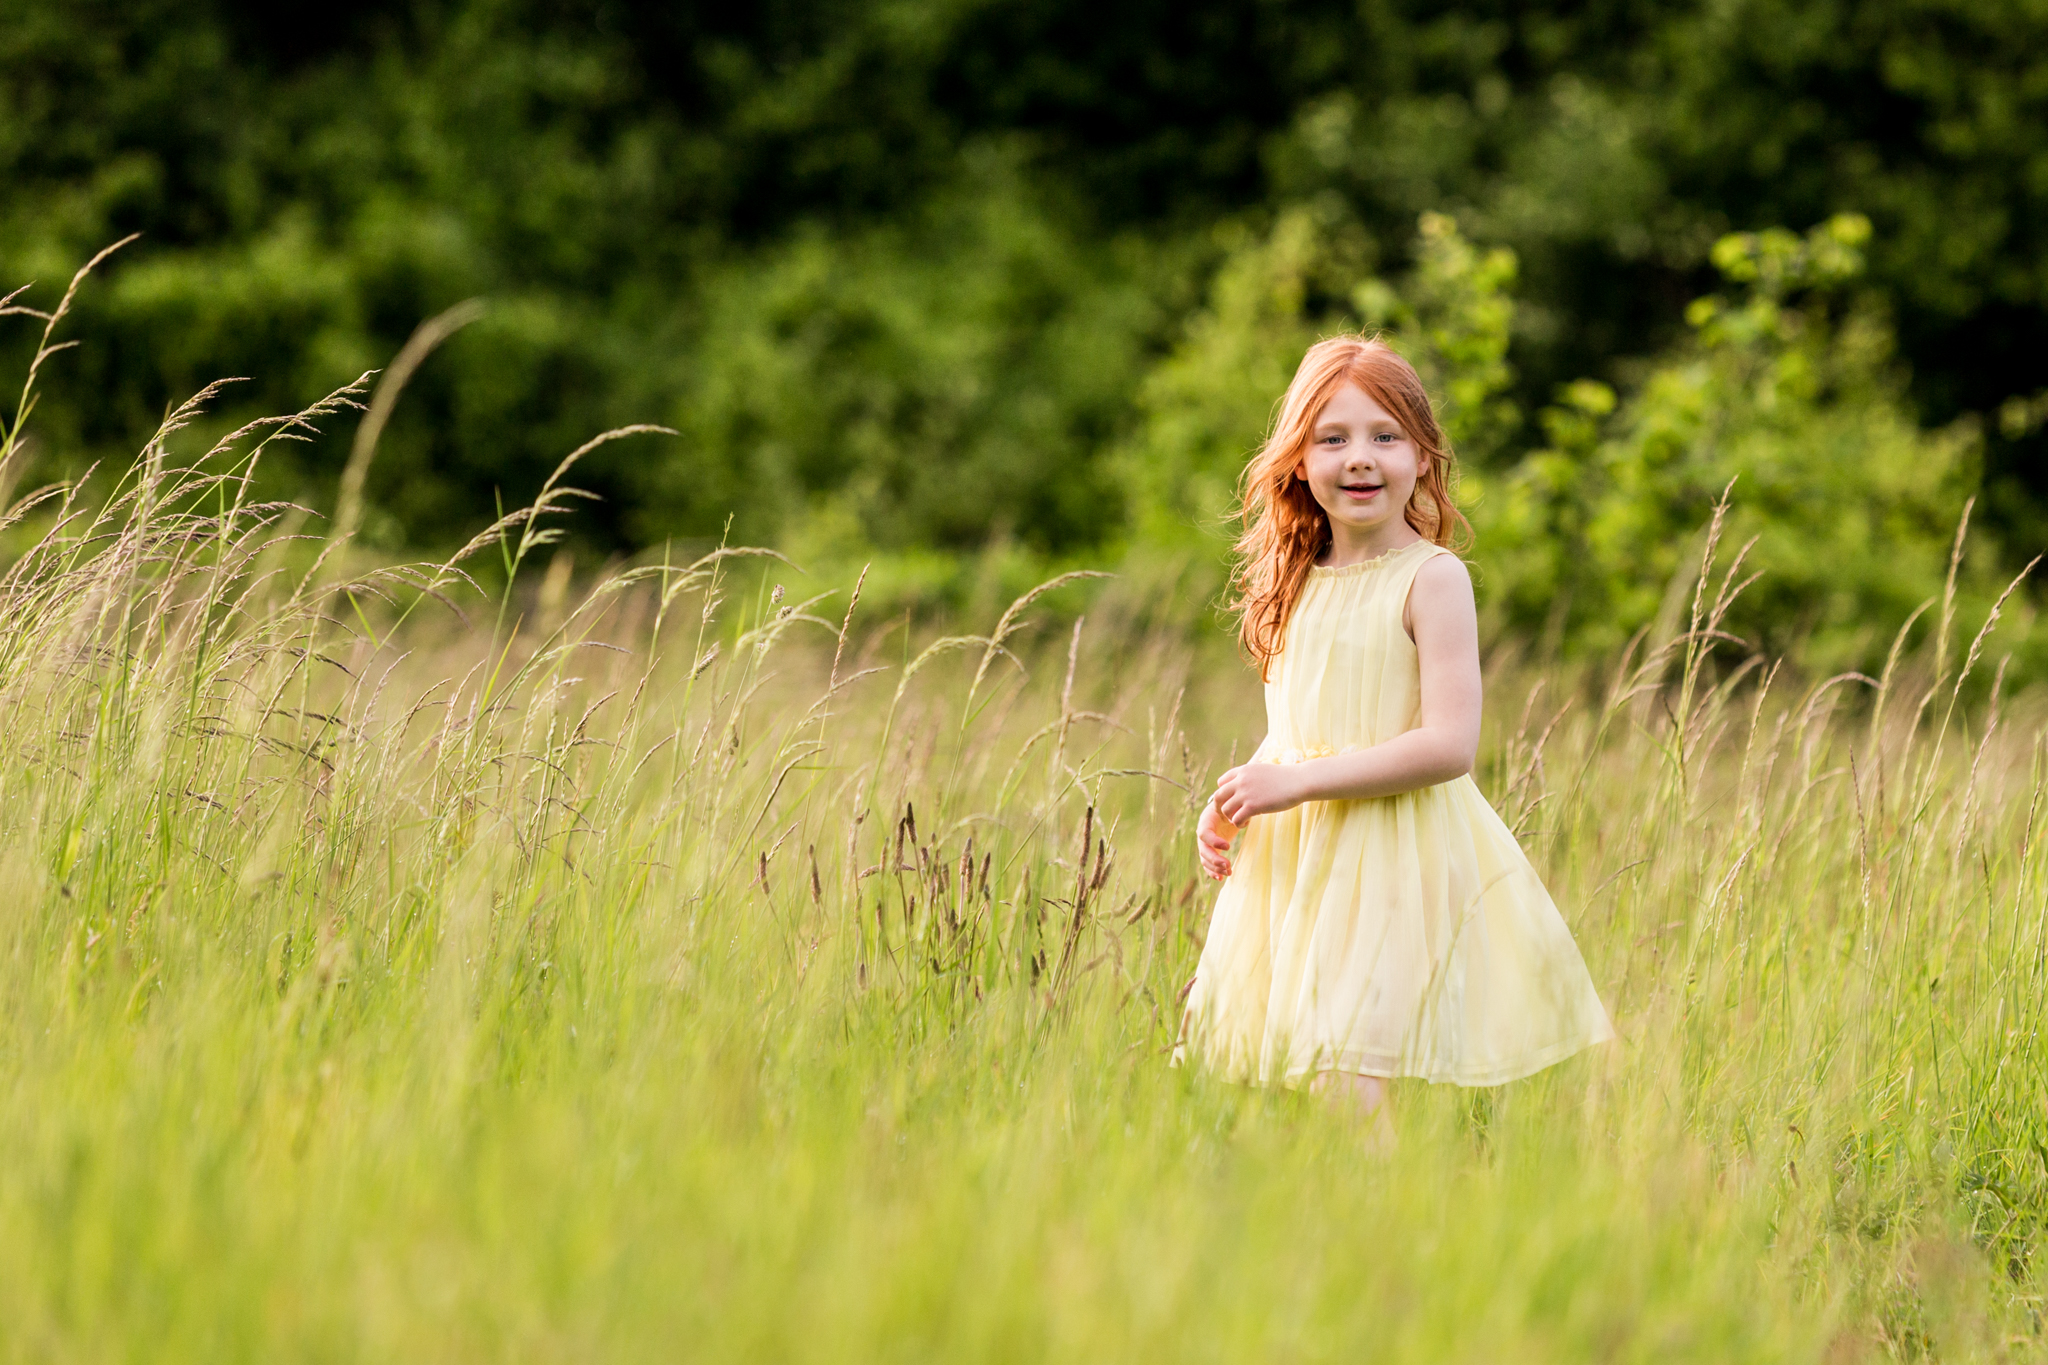 Family_Portraits_Natural_Wedding_Photography_Rachel_Thornhill_Photographer